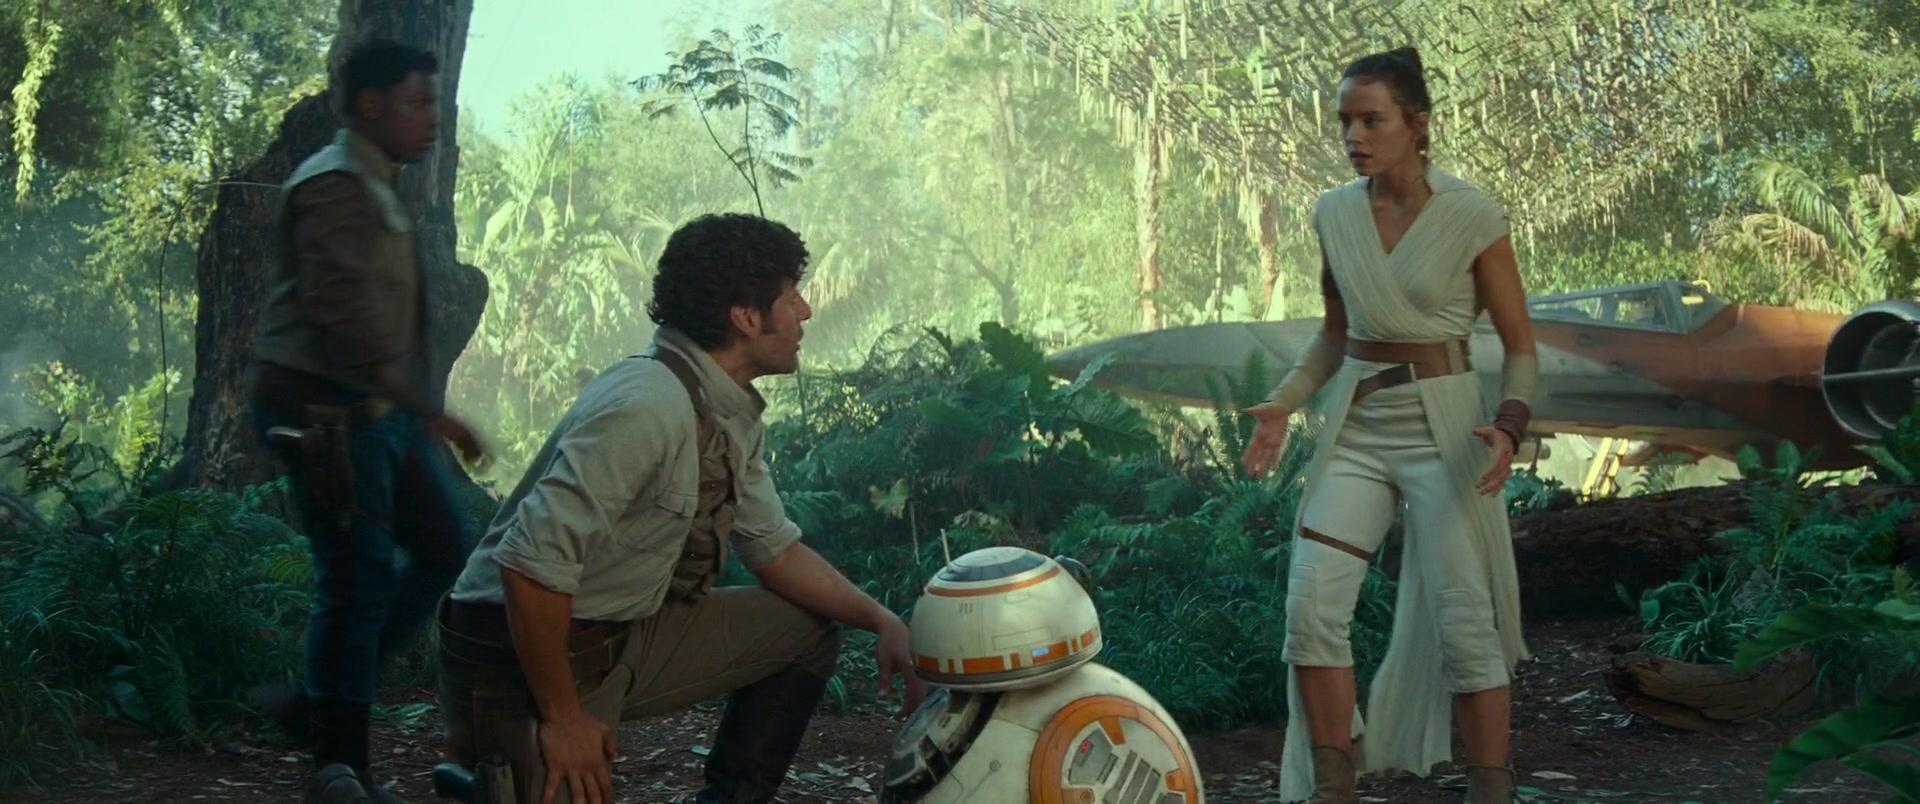 Star Wars Episode IX The Rise of Skywalker 2020 1080p WEB-DL H264 AC3-EVO